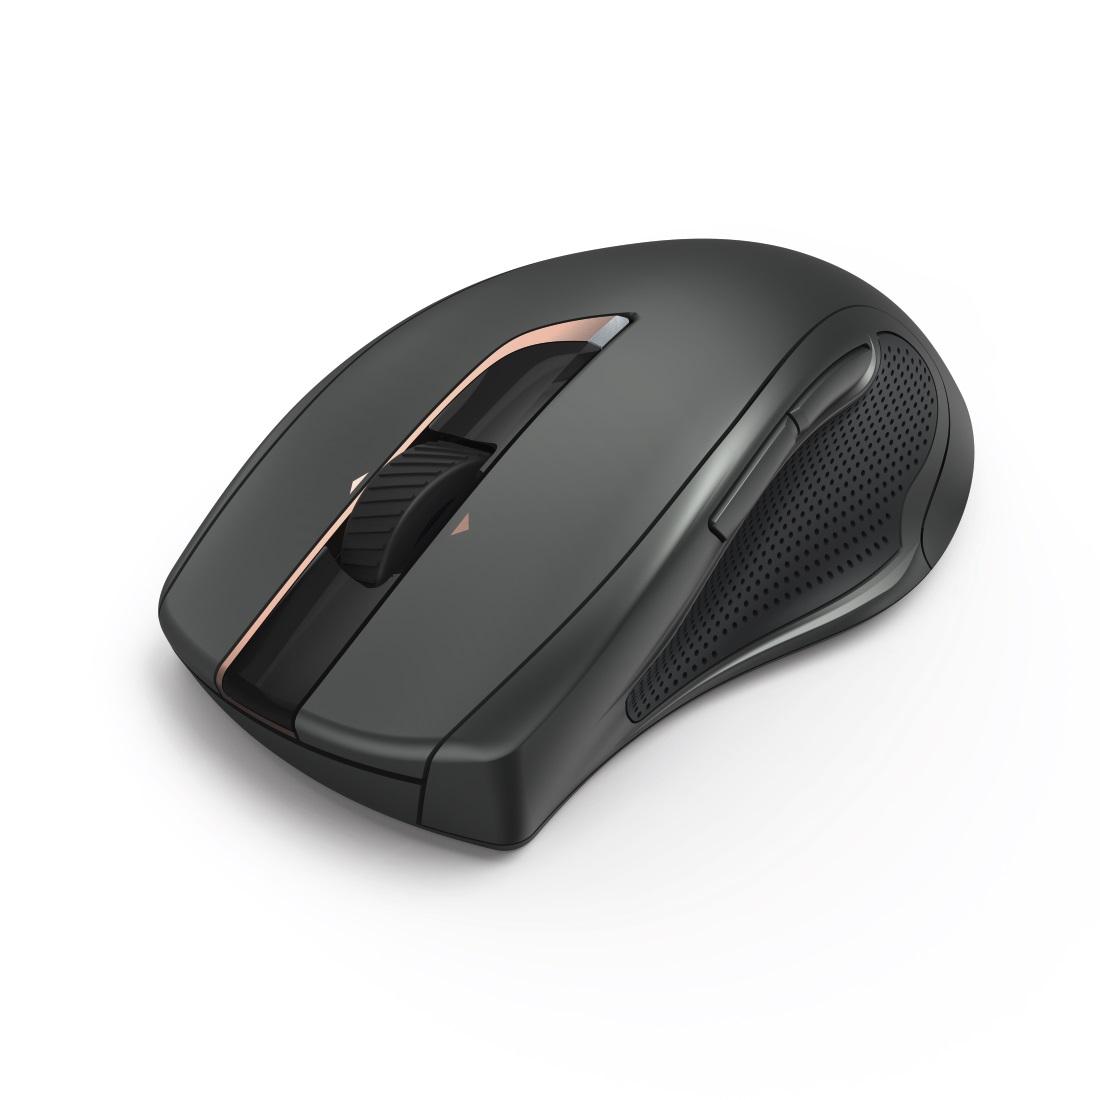 HAMA MW-900 7-Button Laser Wireless Mouse Auto-dpi black